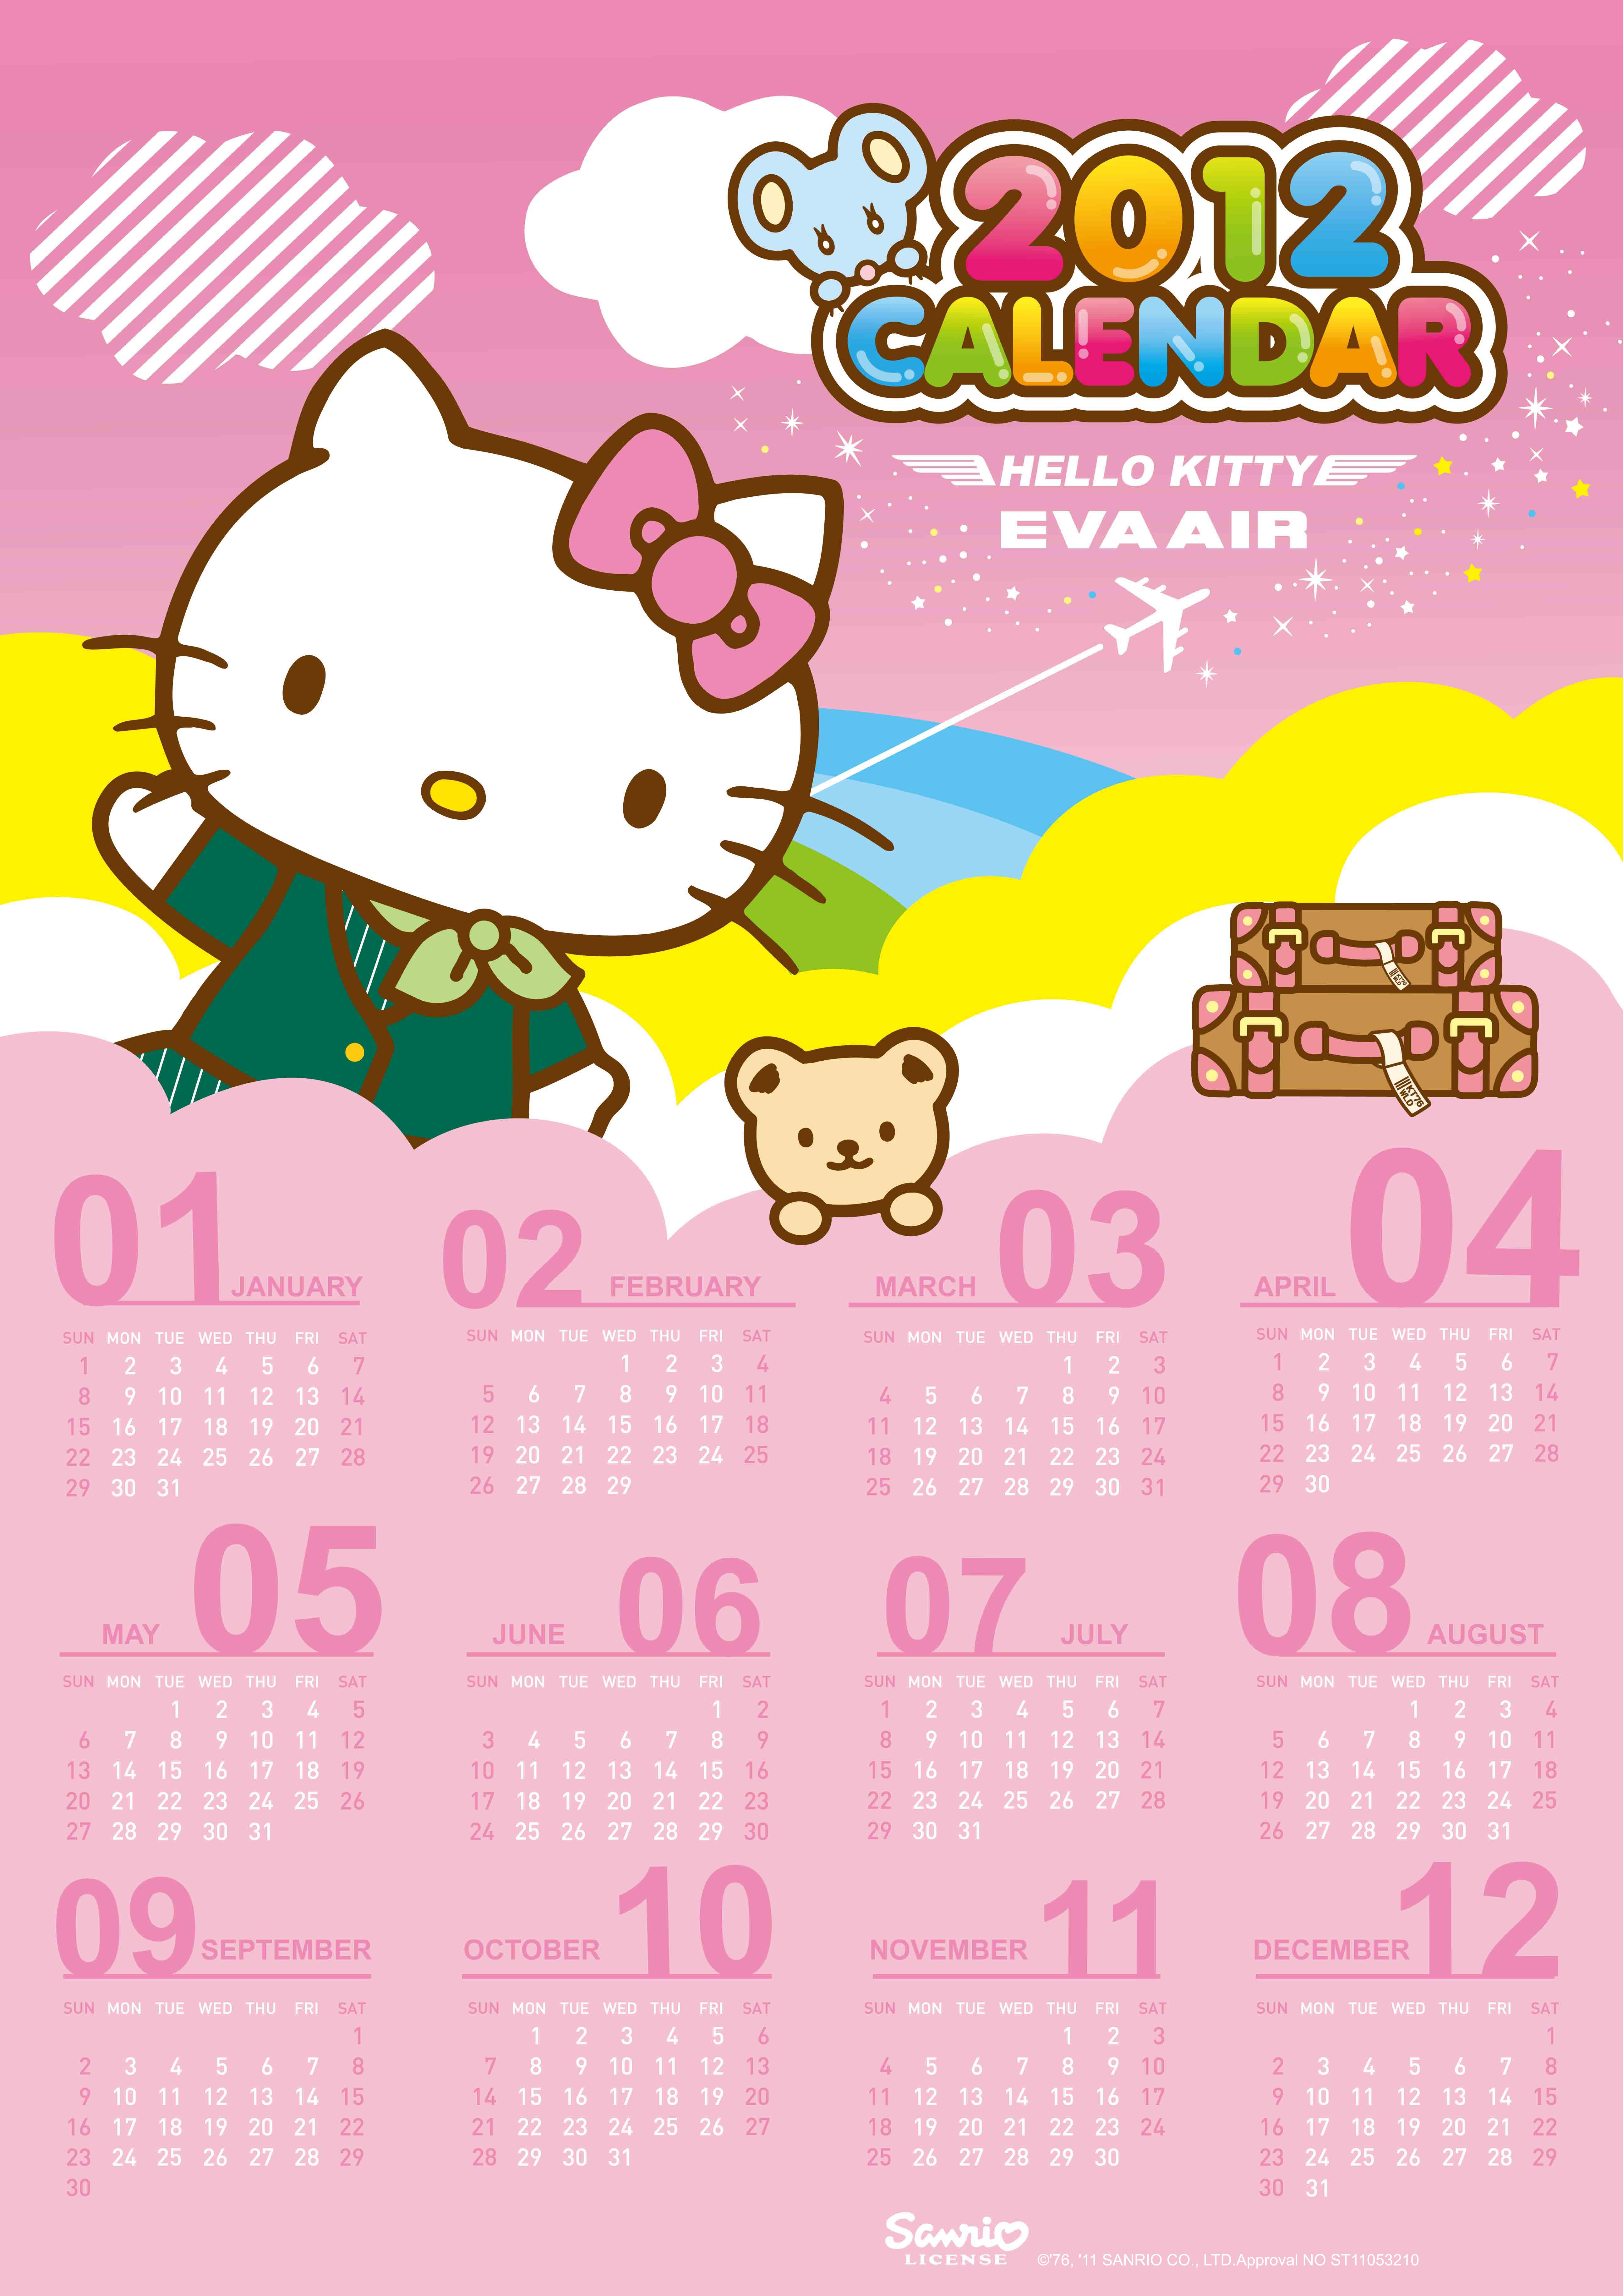 HelloKitty_Calendar_v1